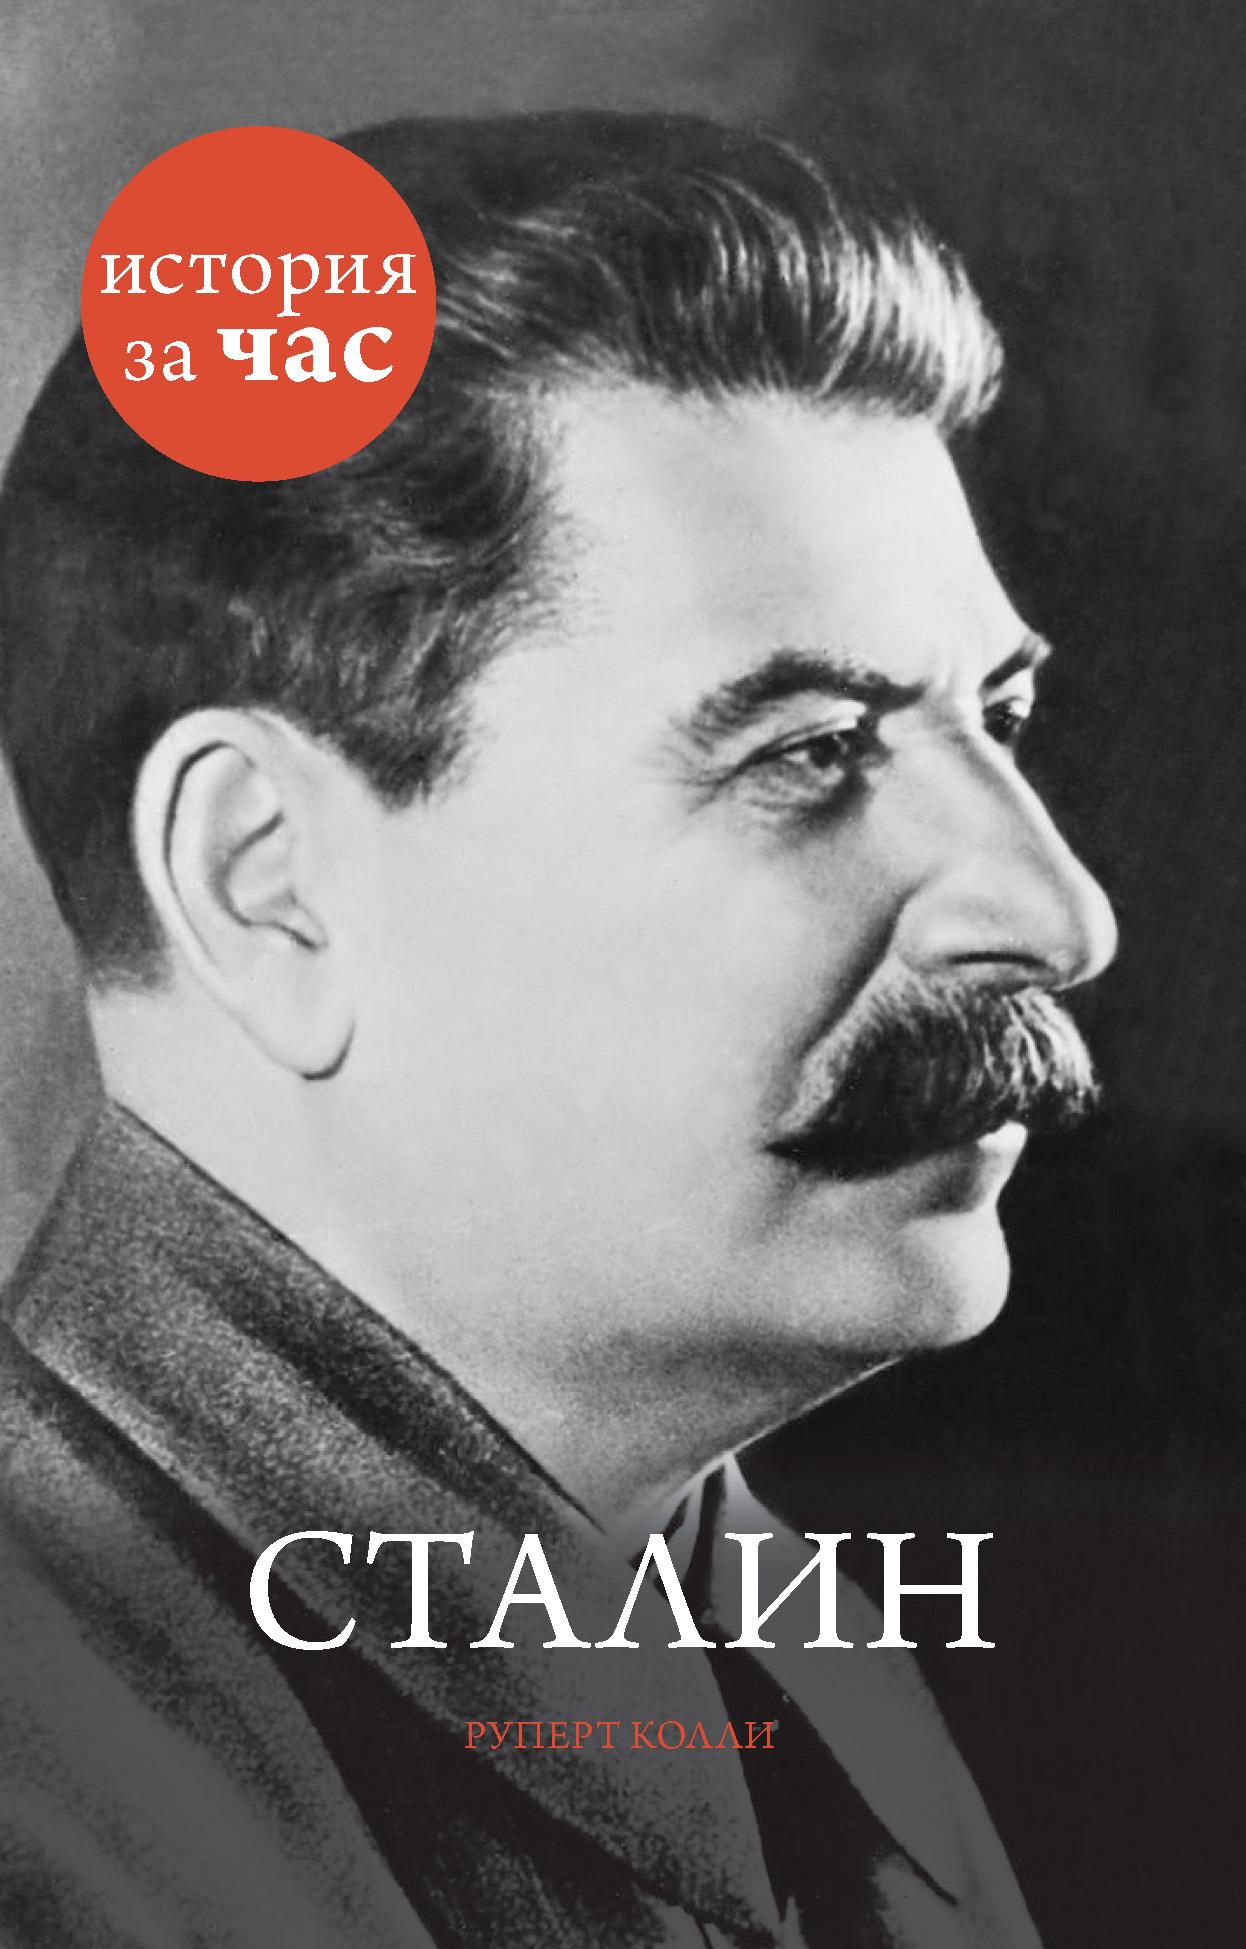 Руперт Колли Сталин